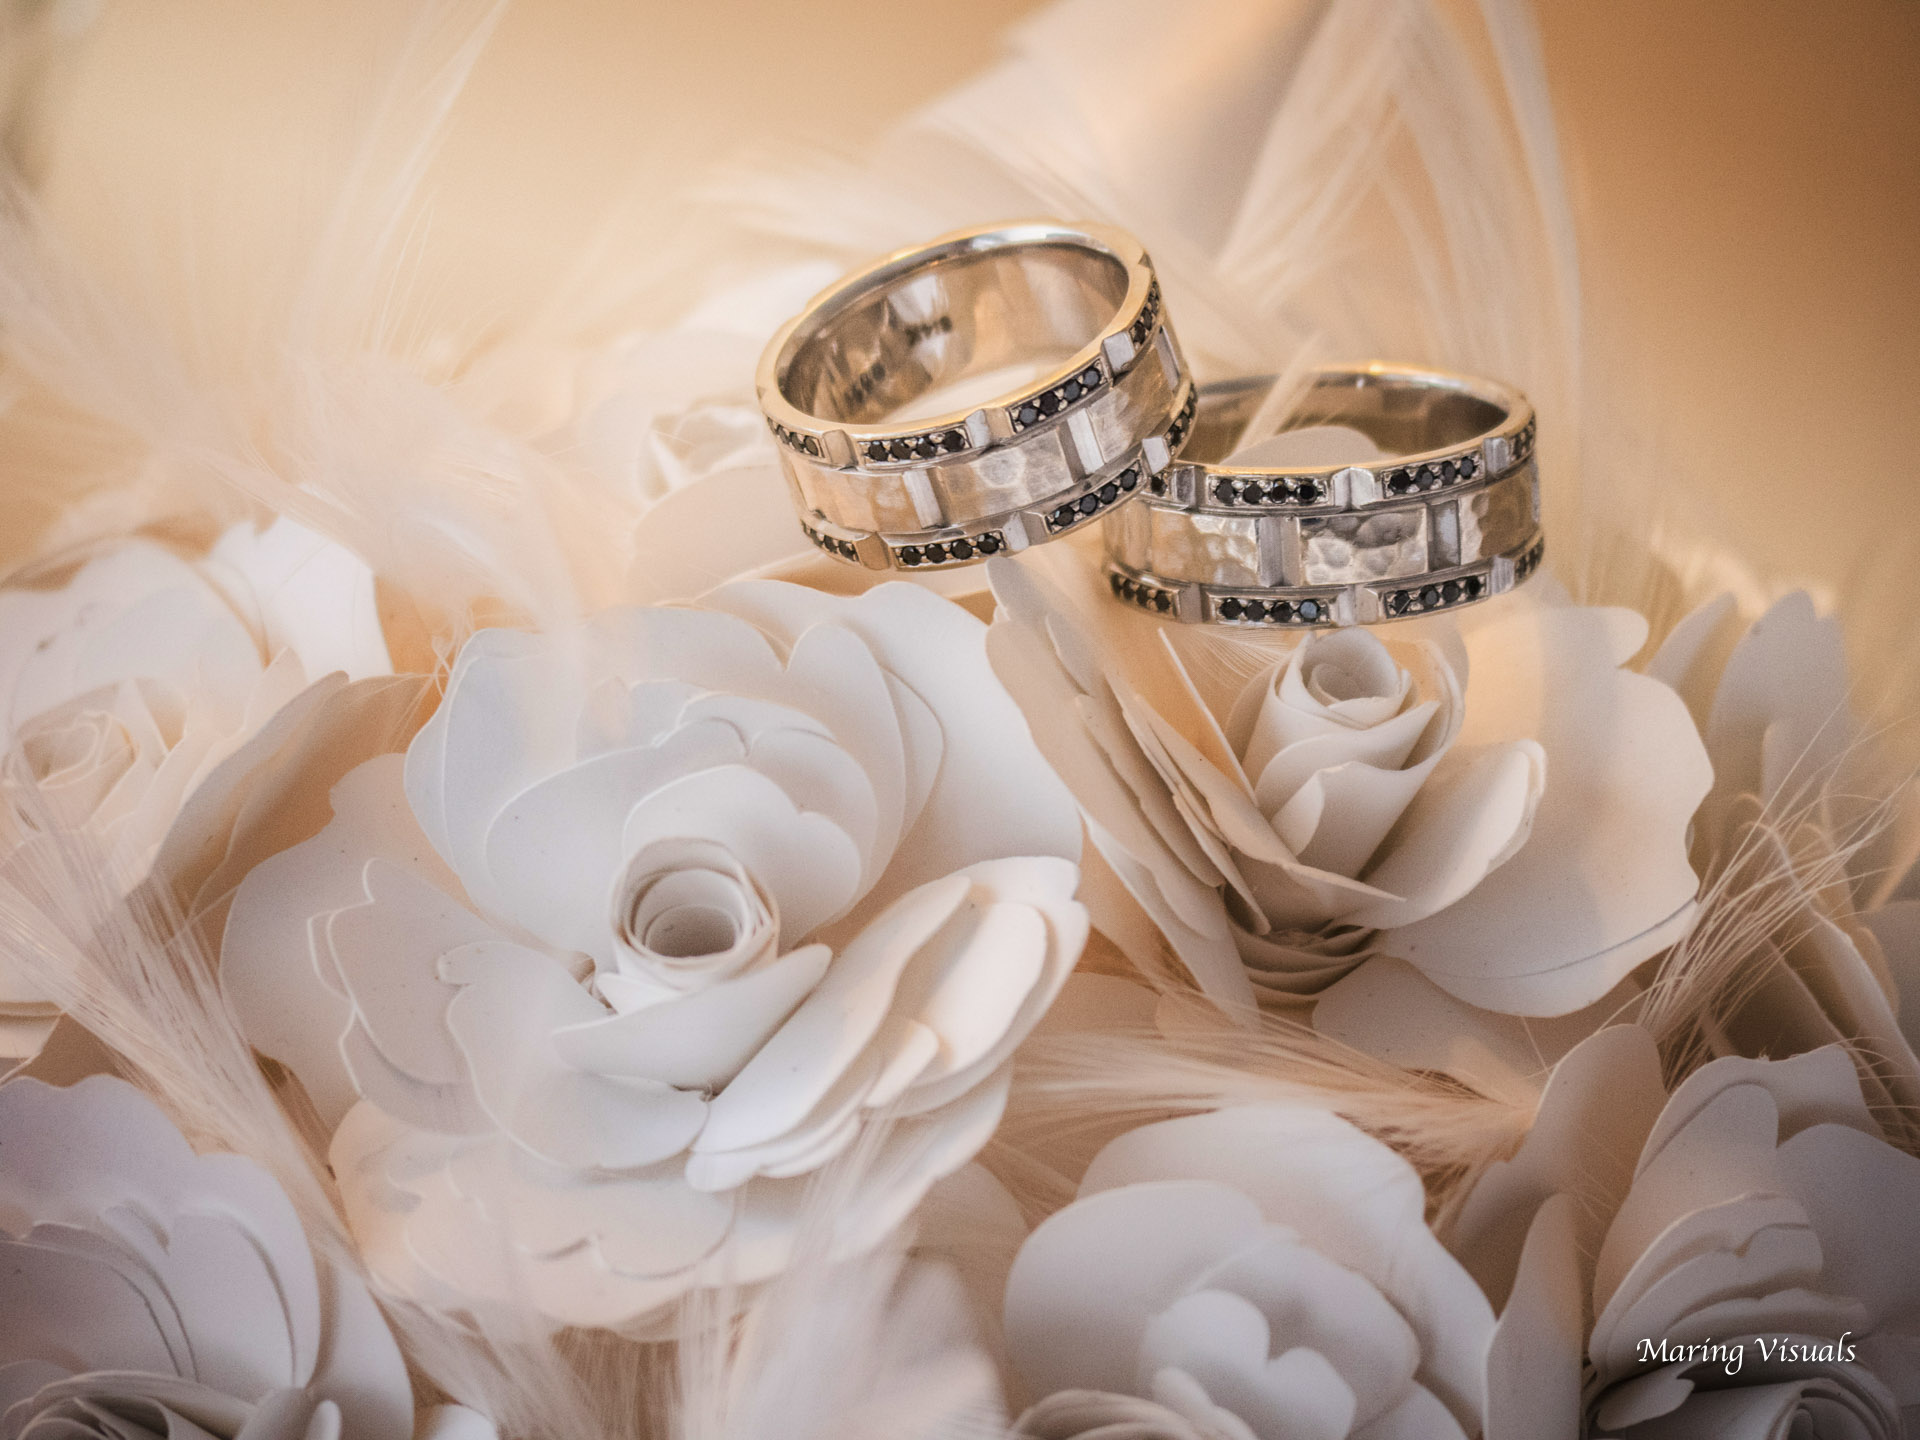 David Tutera Weddings by Maring Visuals 00479.jpg